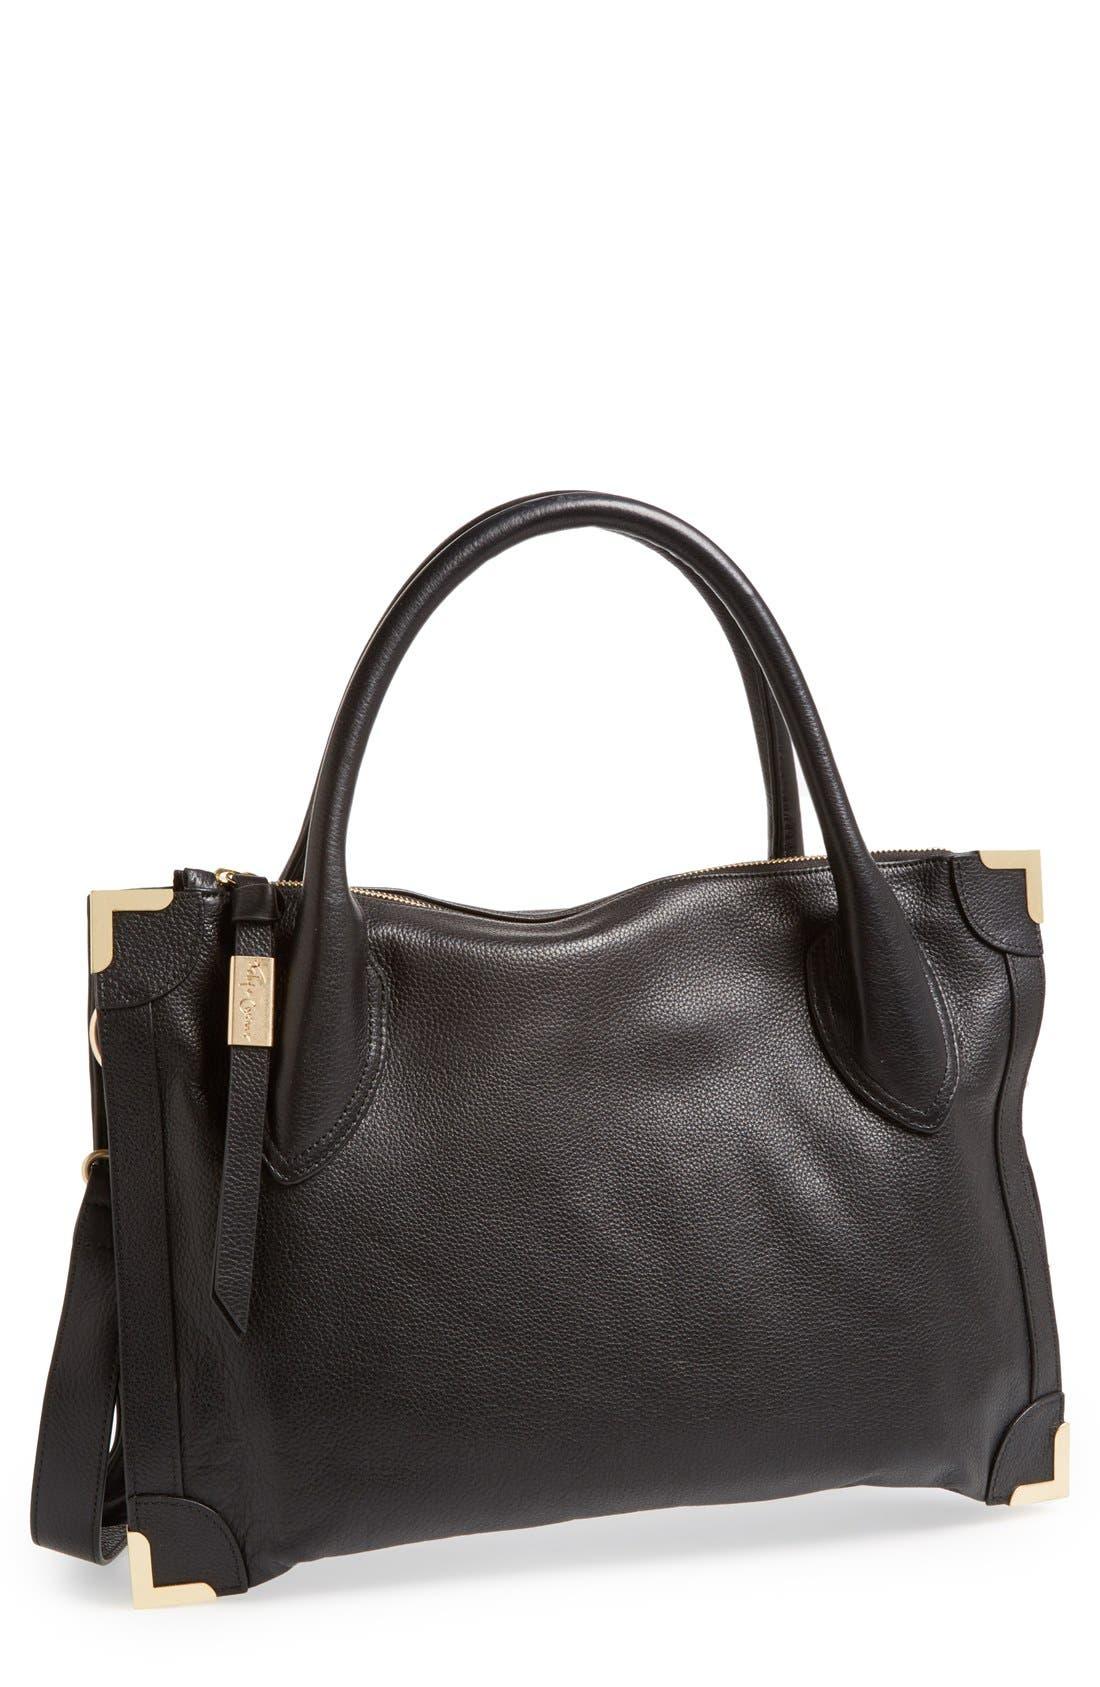 Main Image - Foley & Corinna 'Framed' Leather Satchel